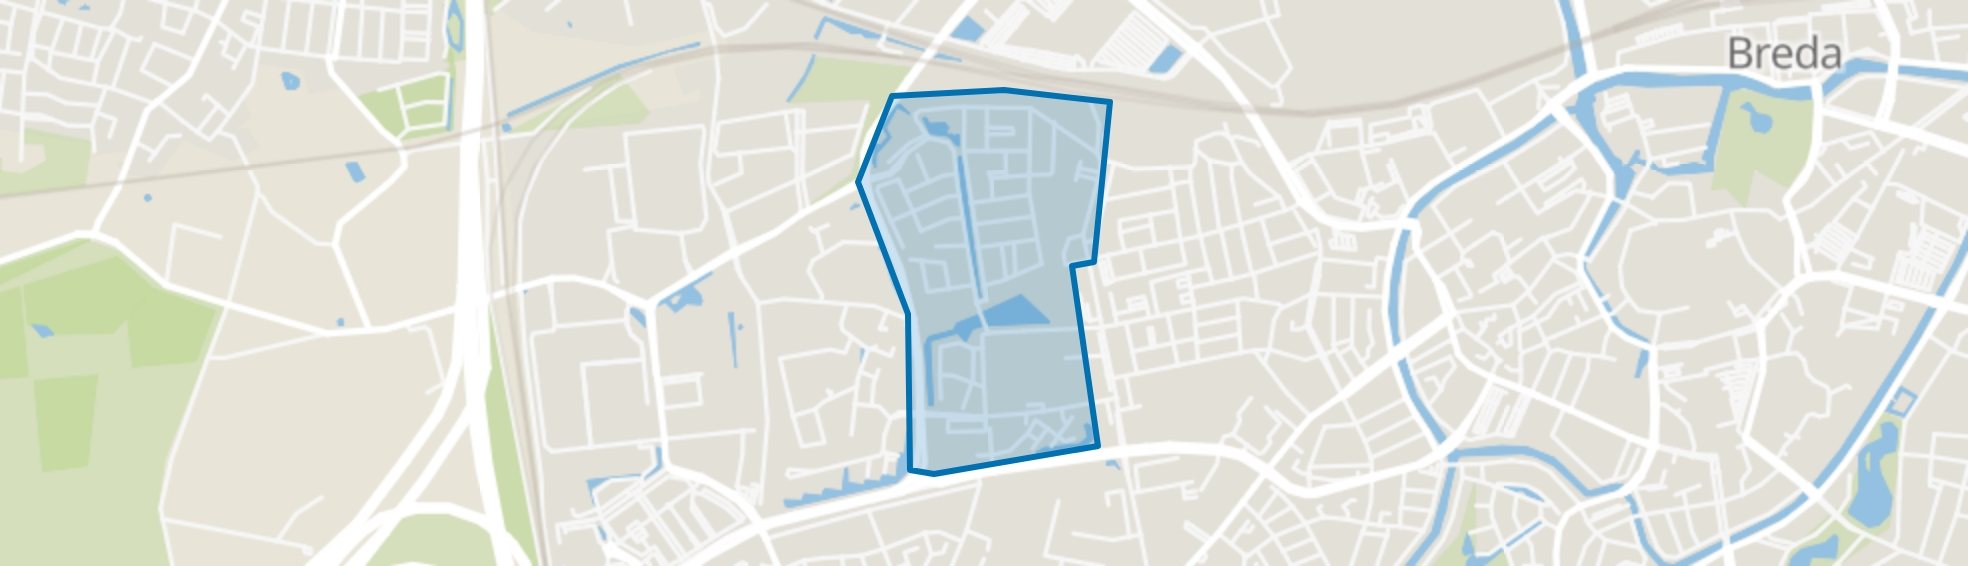 Westerpark, Breda map